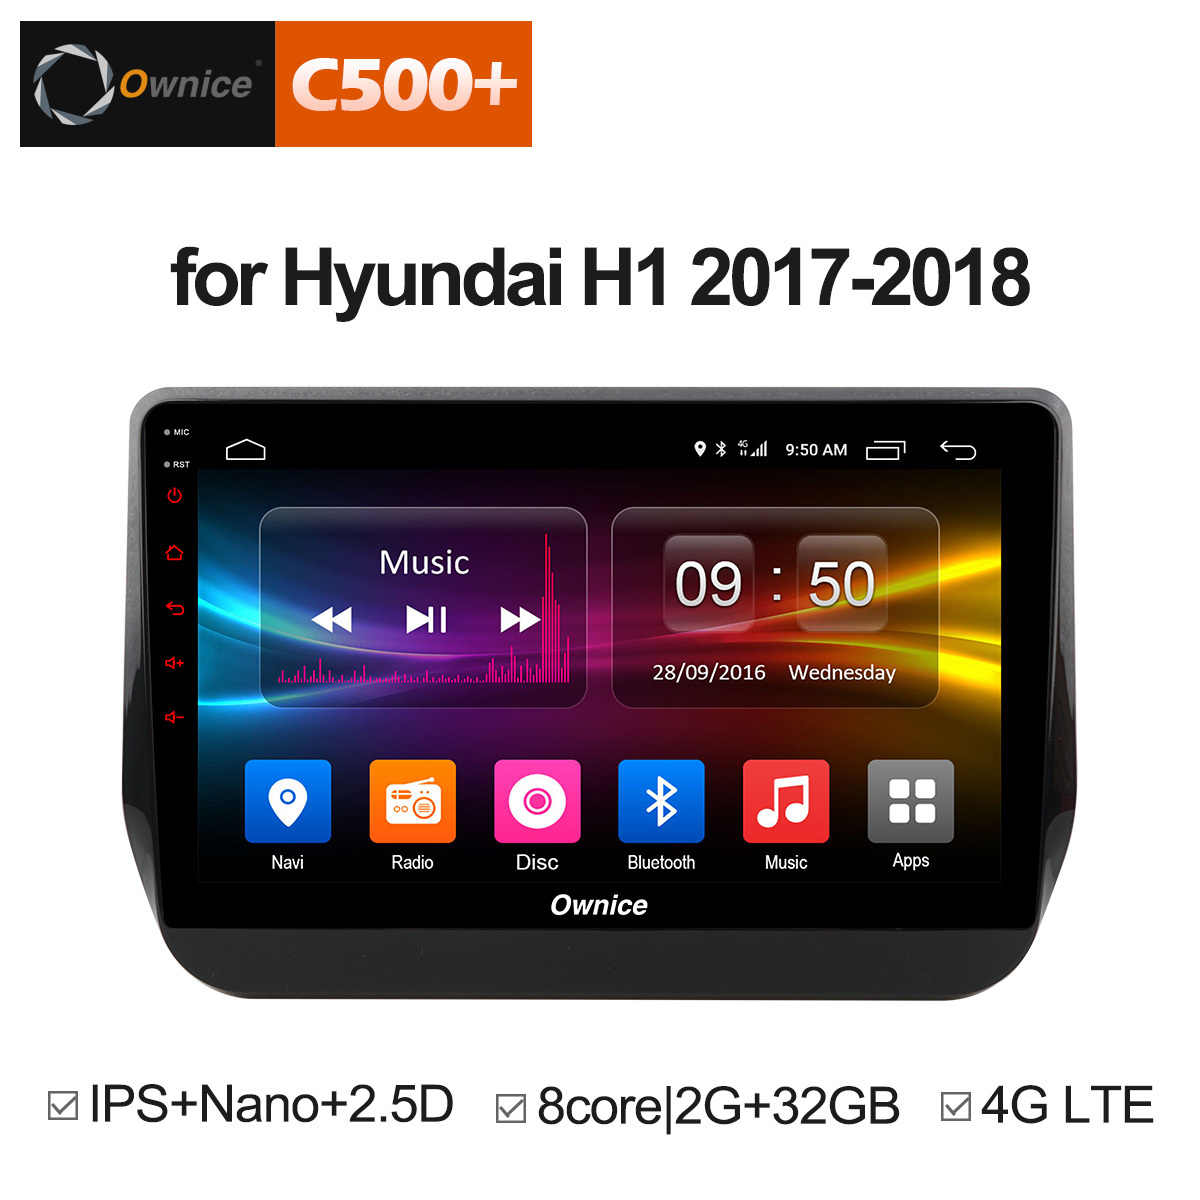 Ownice C500 + G10 9 inch Android 8.1 Autoradio DVD Voor Hyundai H1 Grand Starex 2017 2018 2 GB + 32 GB DVD GPS Wifi 4G LTE Octa Core